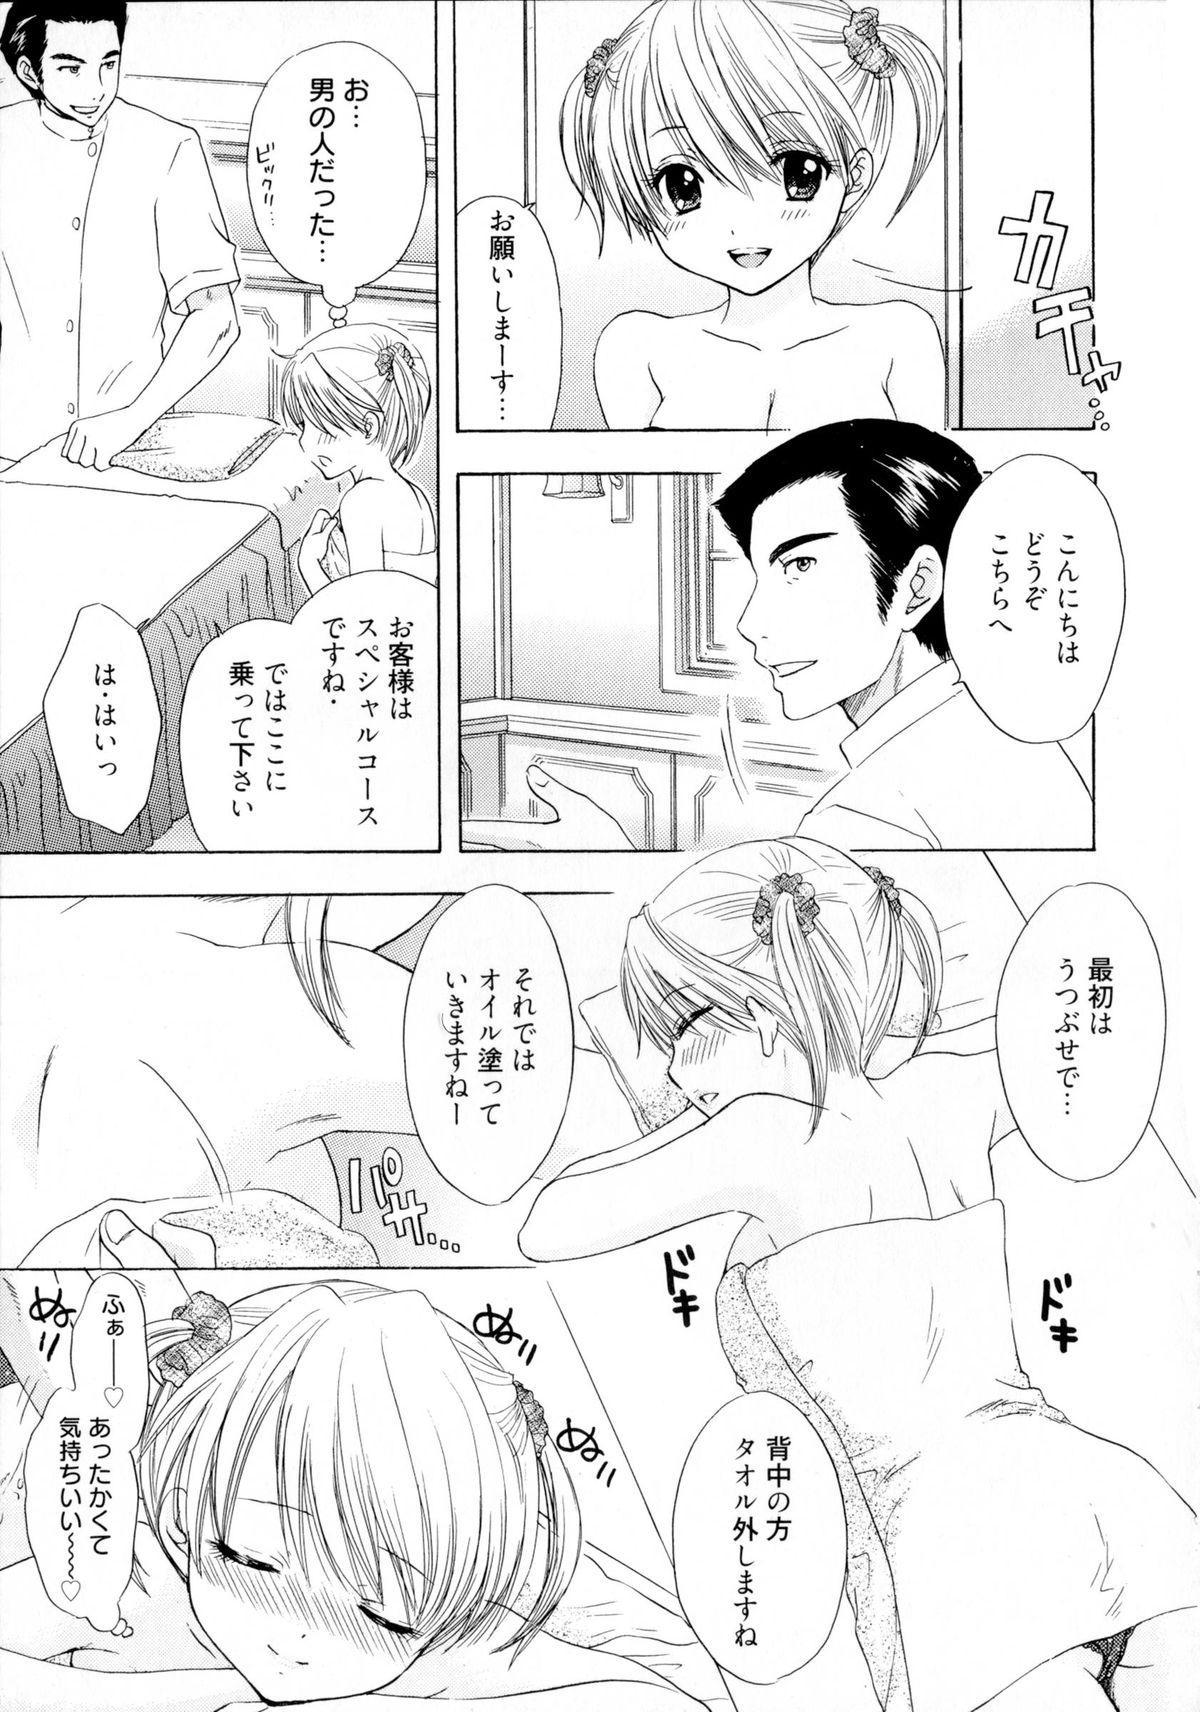 The Great Escape 4 Shokai Genteiban 40